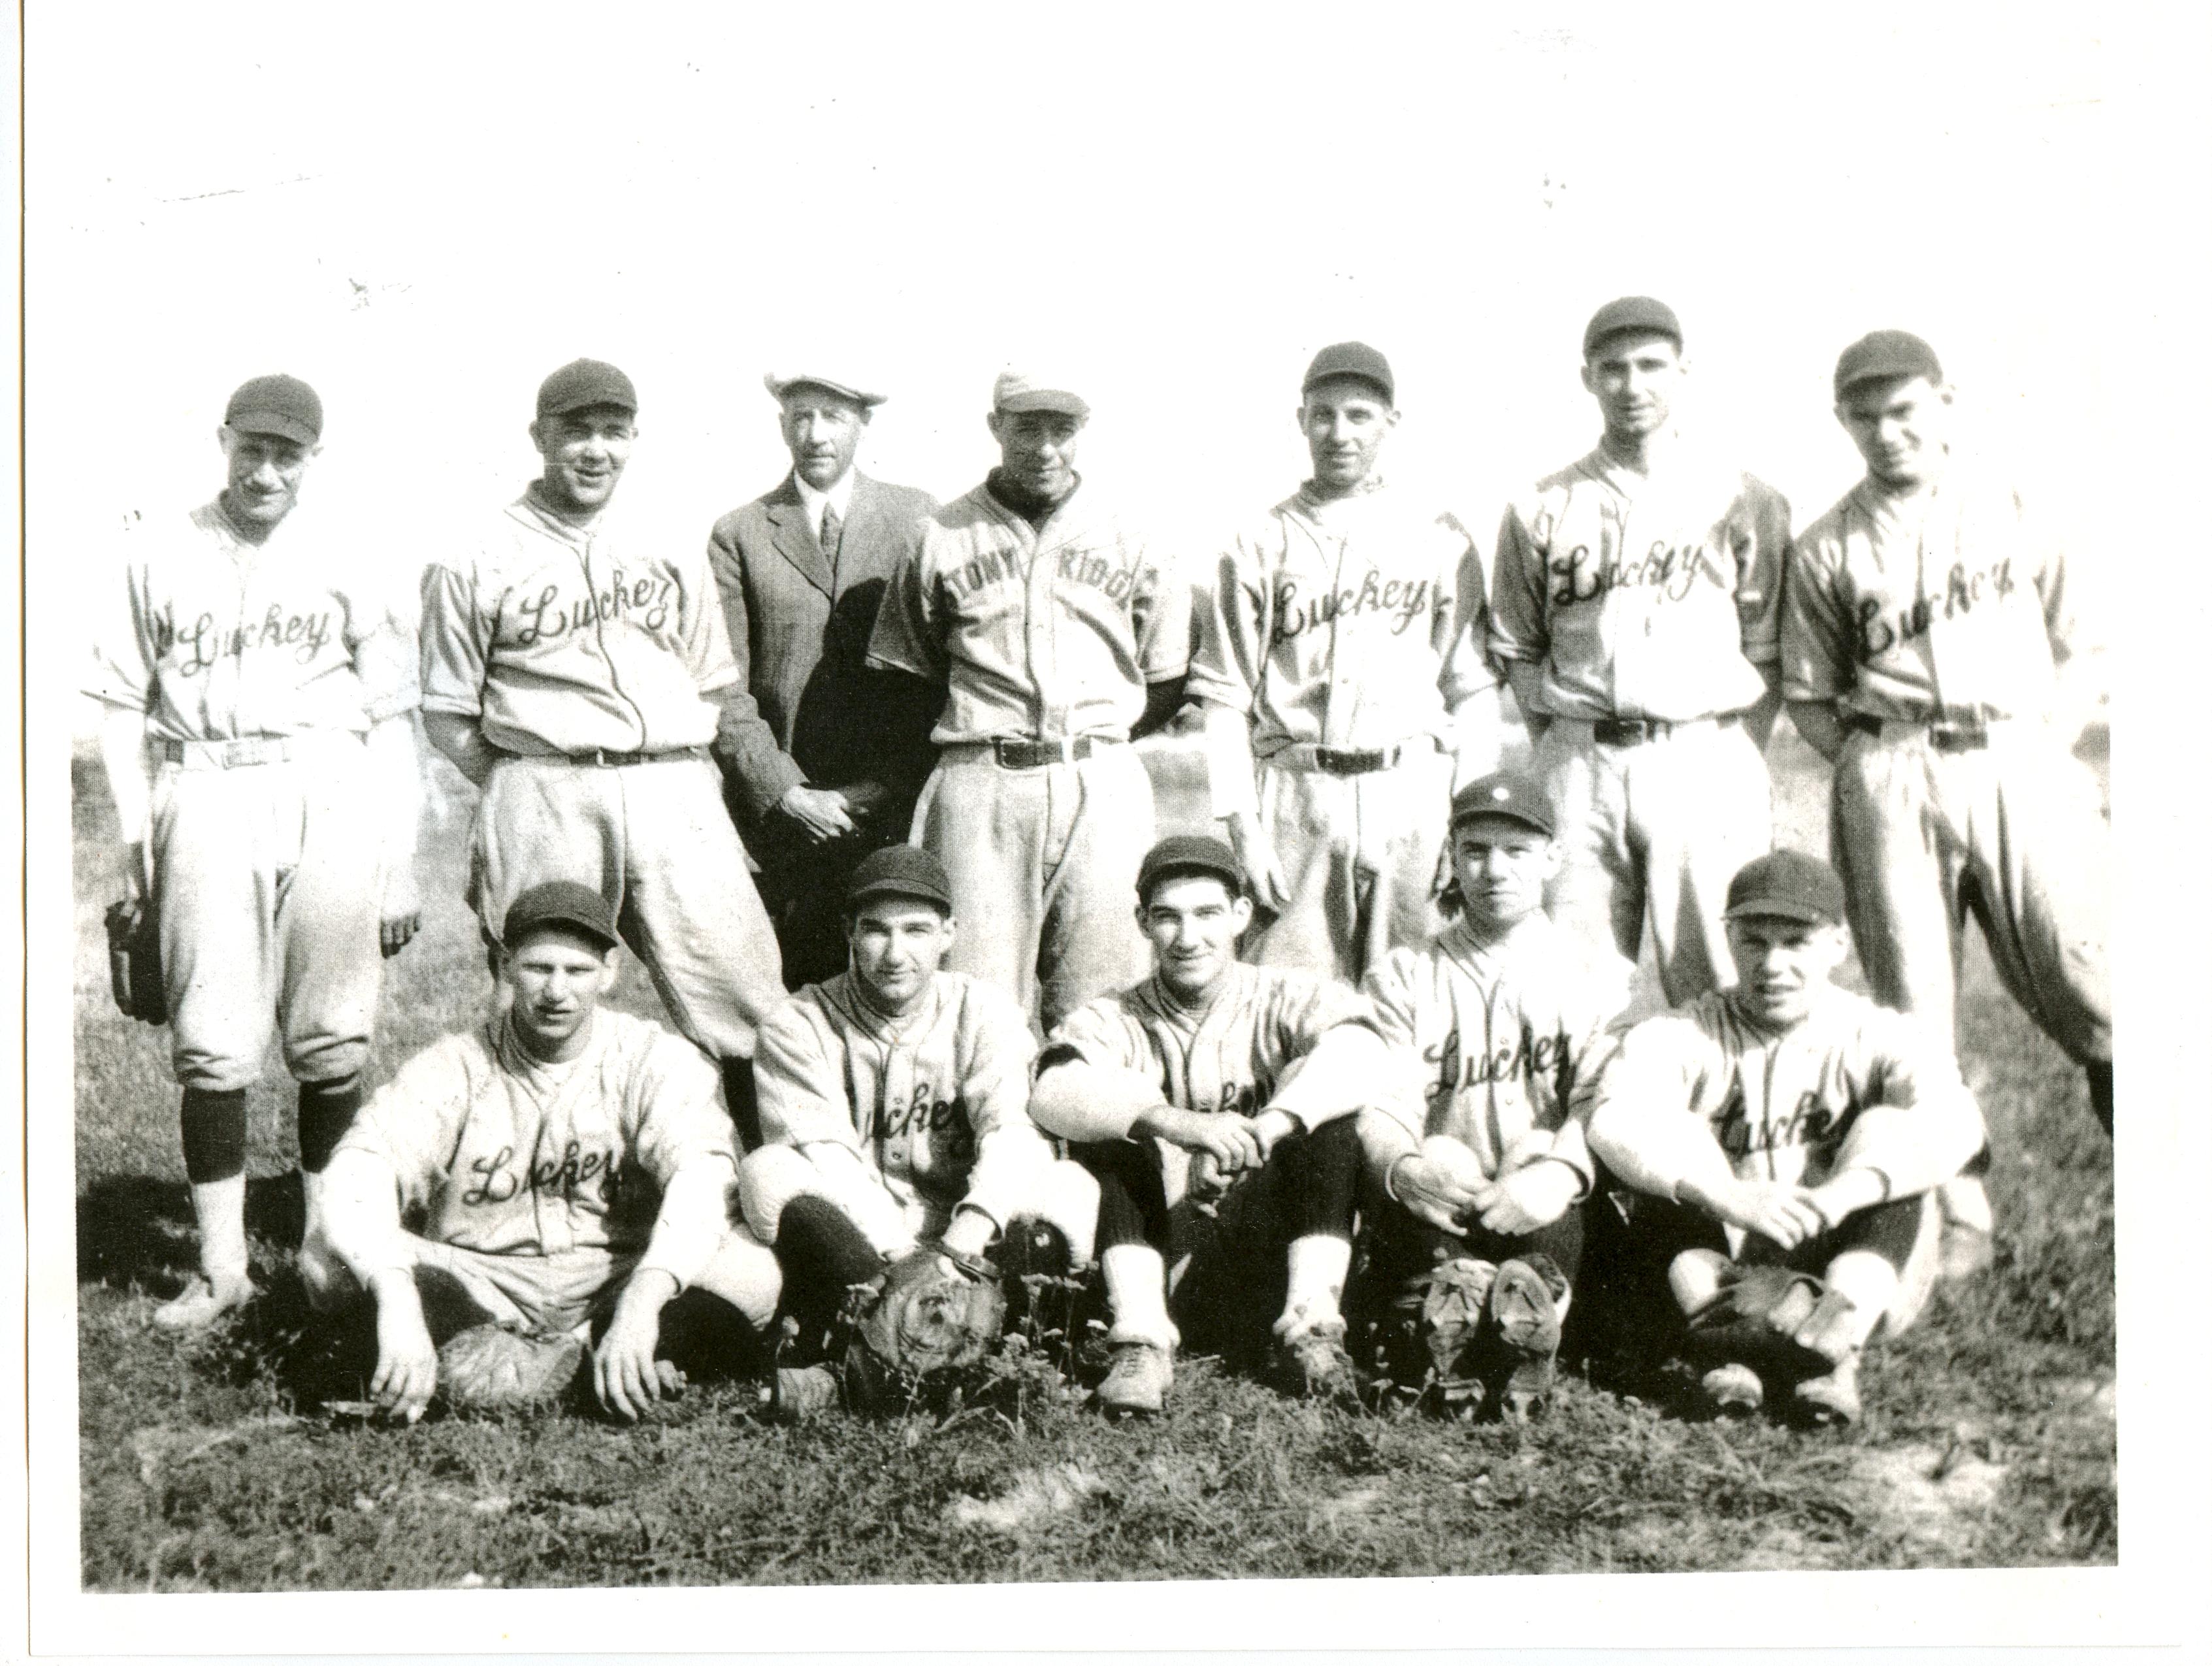 Luckey baseball team